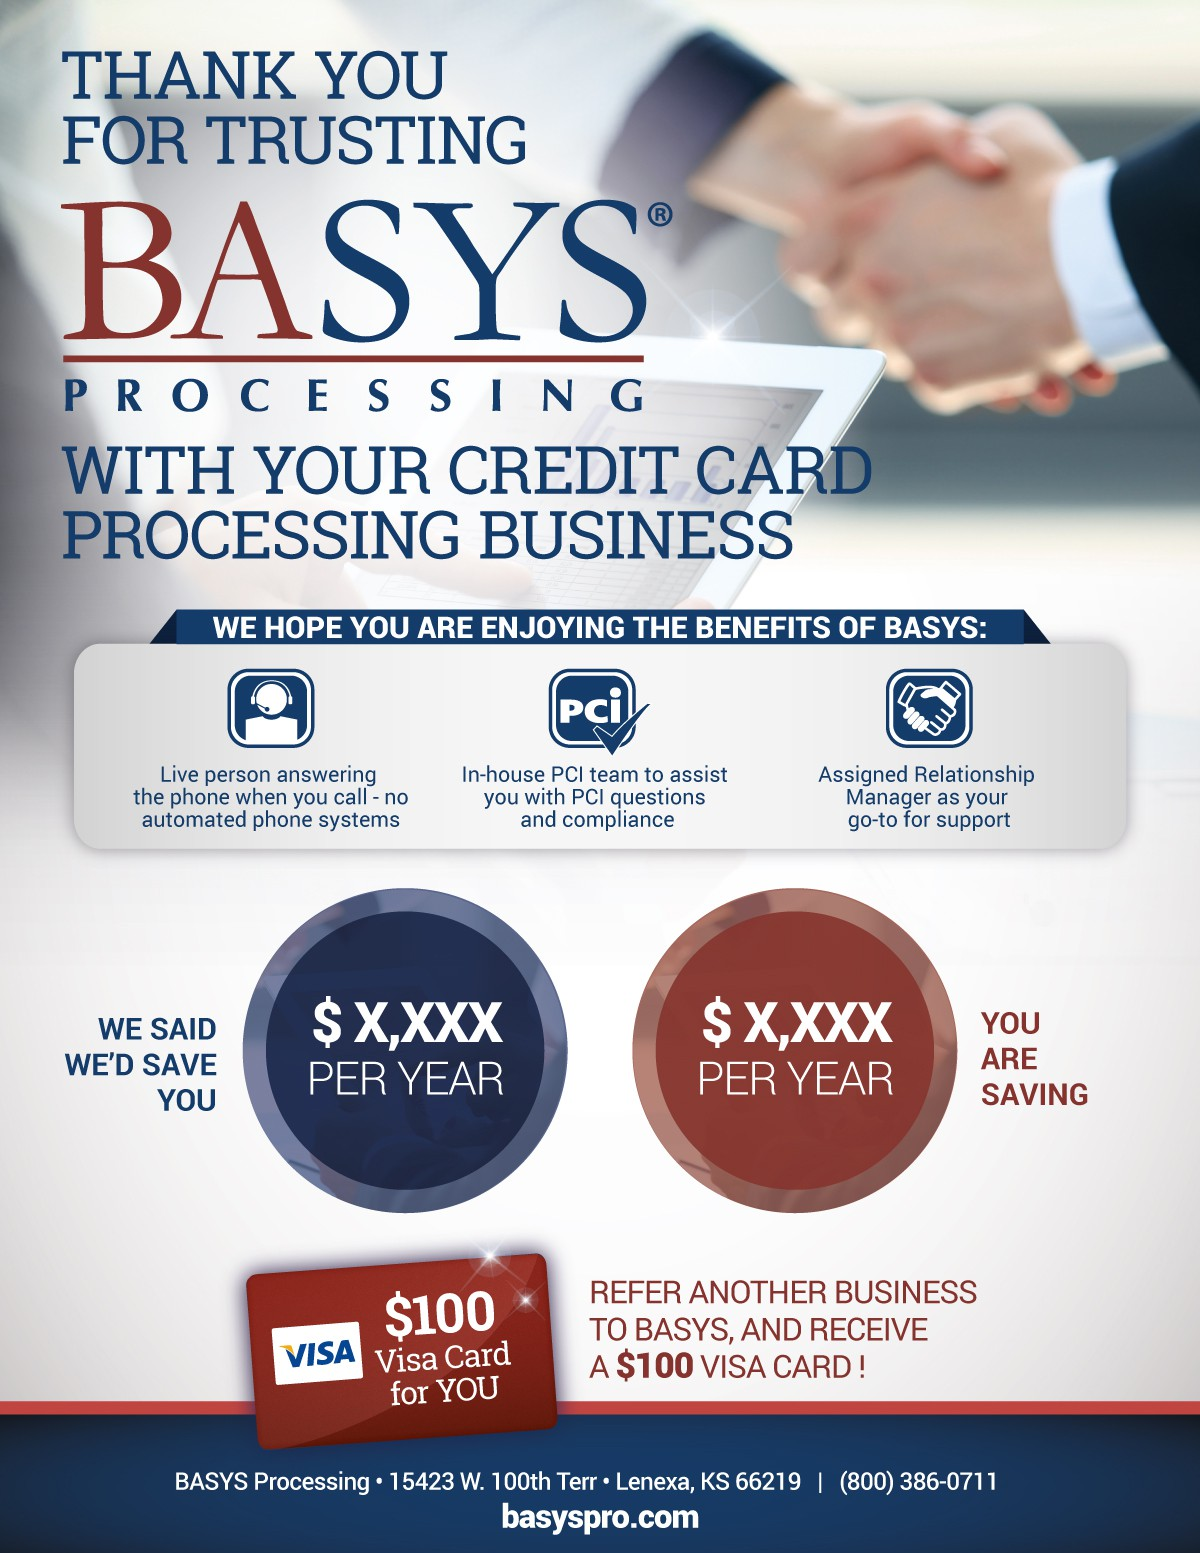 BASYS - Proof of Savings